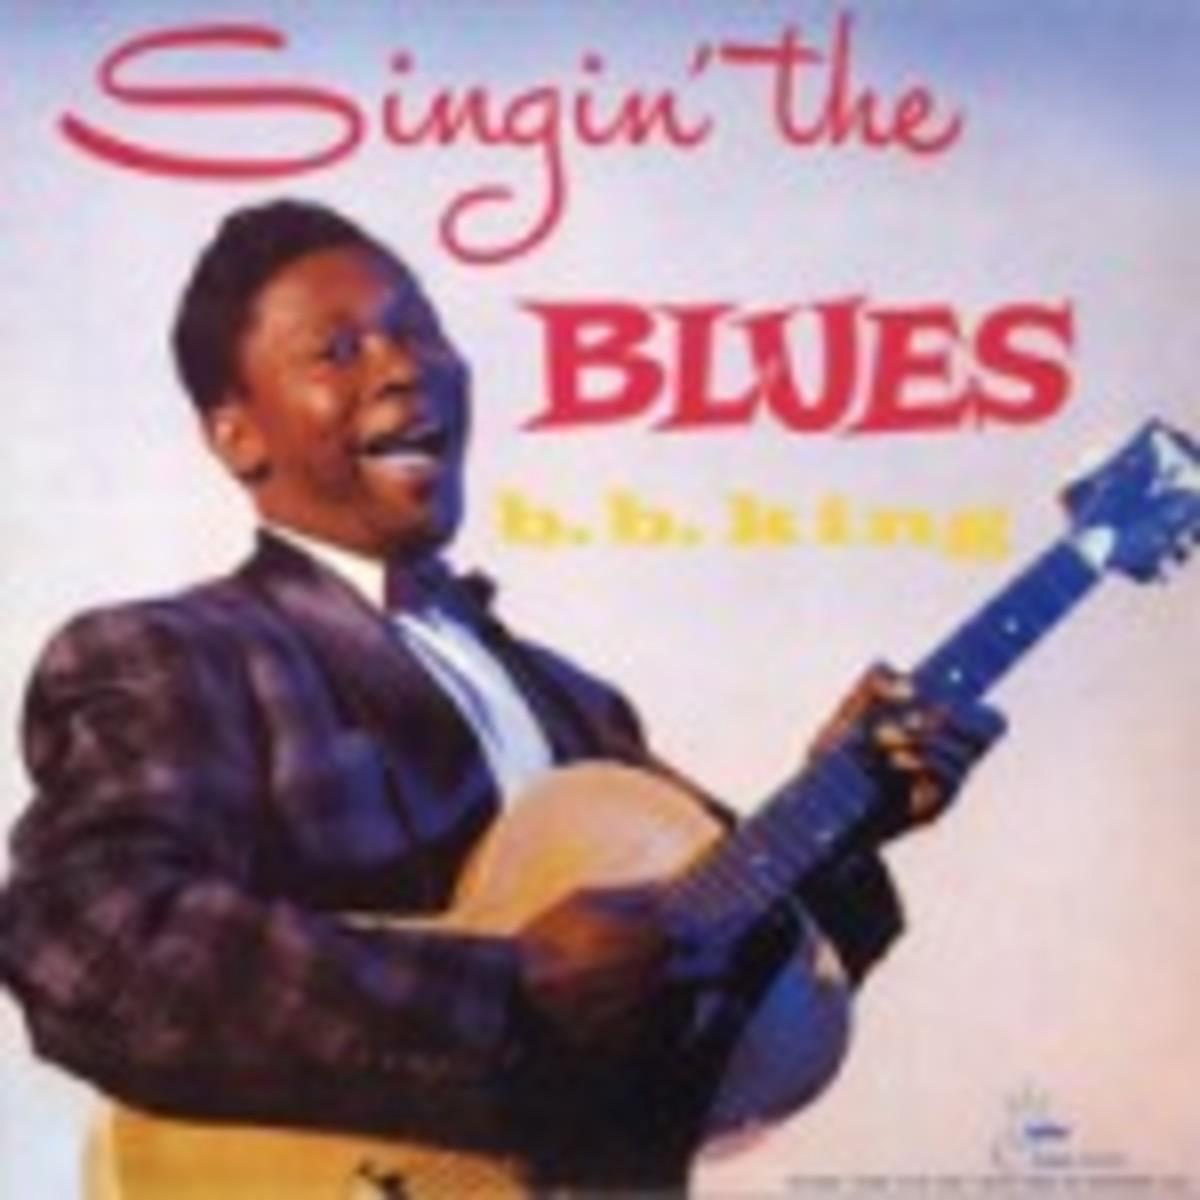 B.B. King Singing The Blues